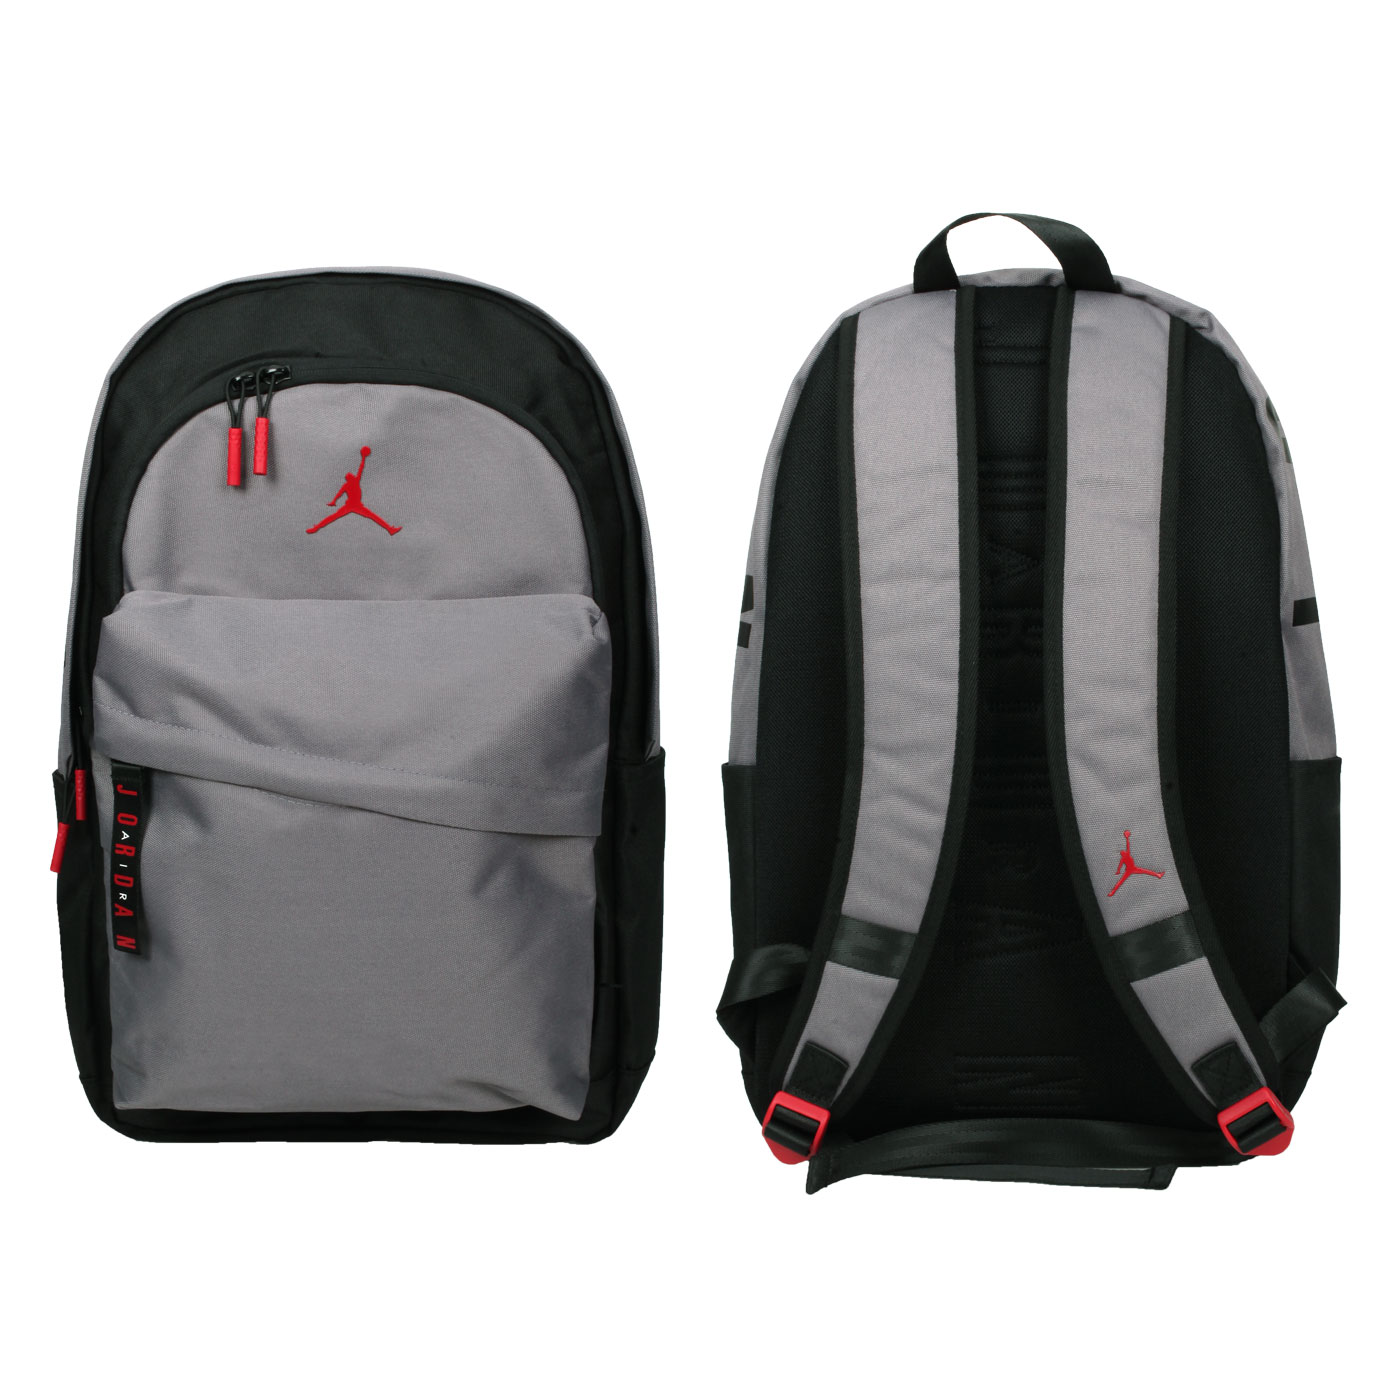 NIKE 大型雙肩包 JD2123006GS-002 - 黑灰紅